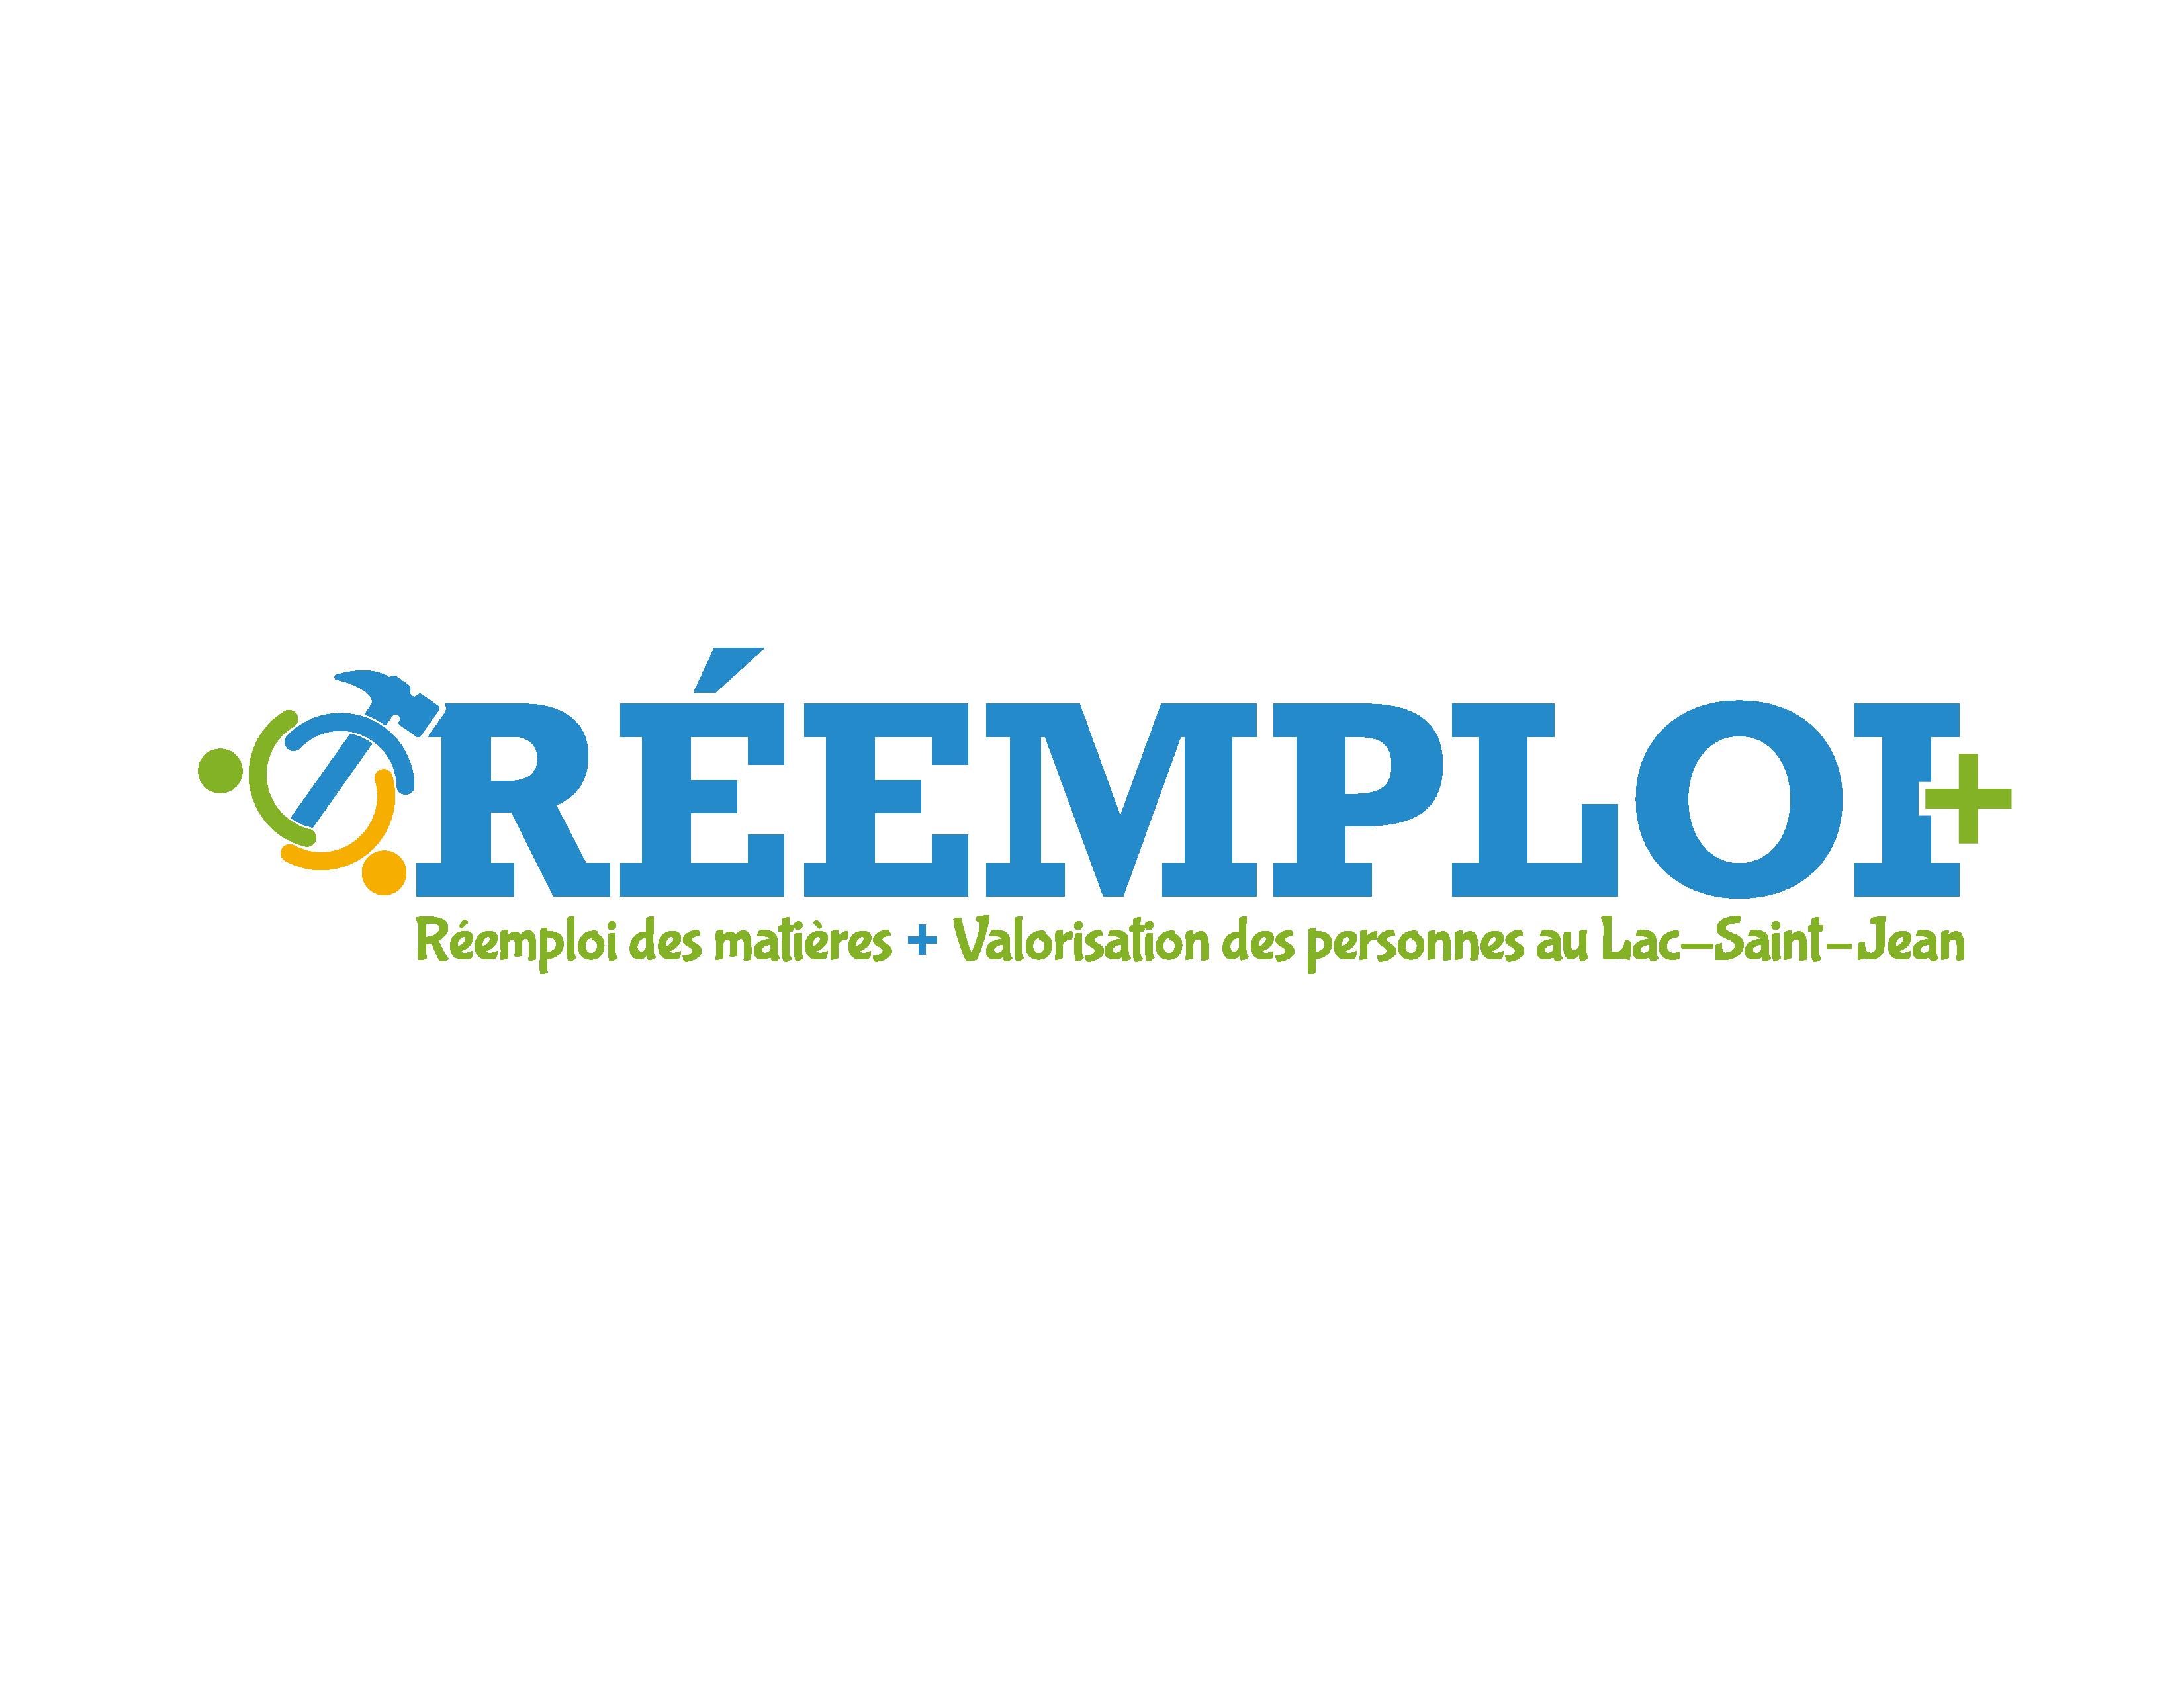 logo de Réemploi +